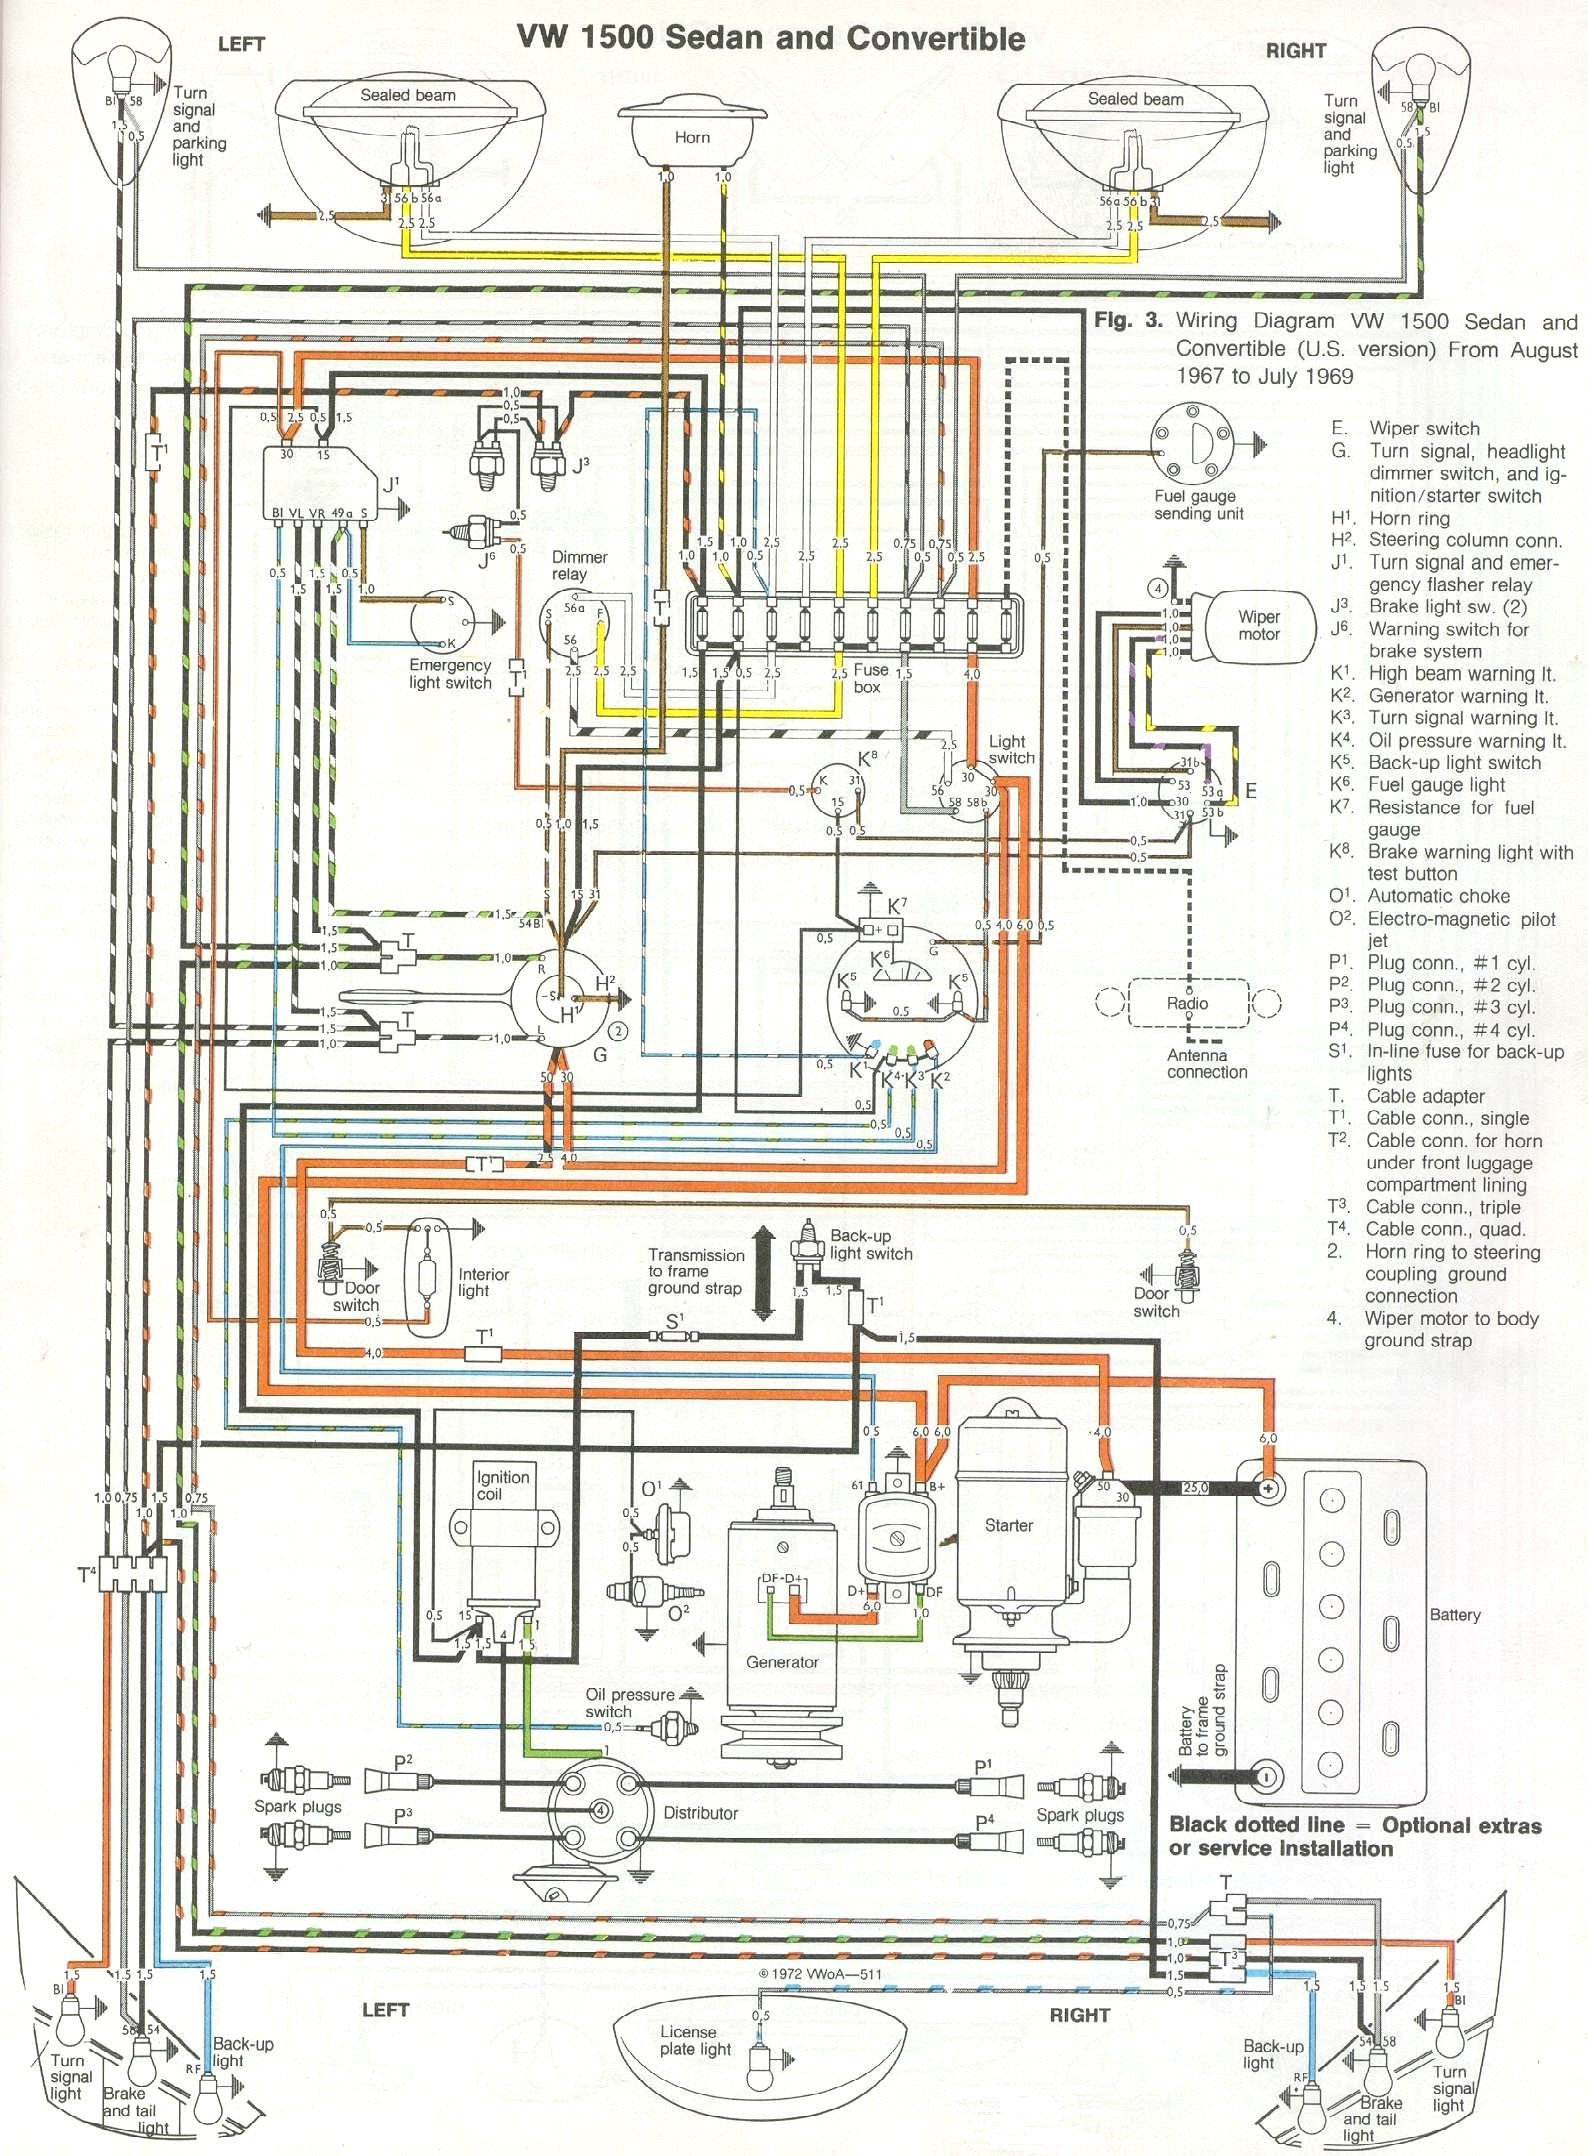 Miraculous 74 Vw Engine Diagram Wiring Library Wiring Cloud Eachirenstrafr09Org